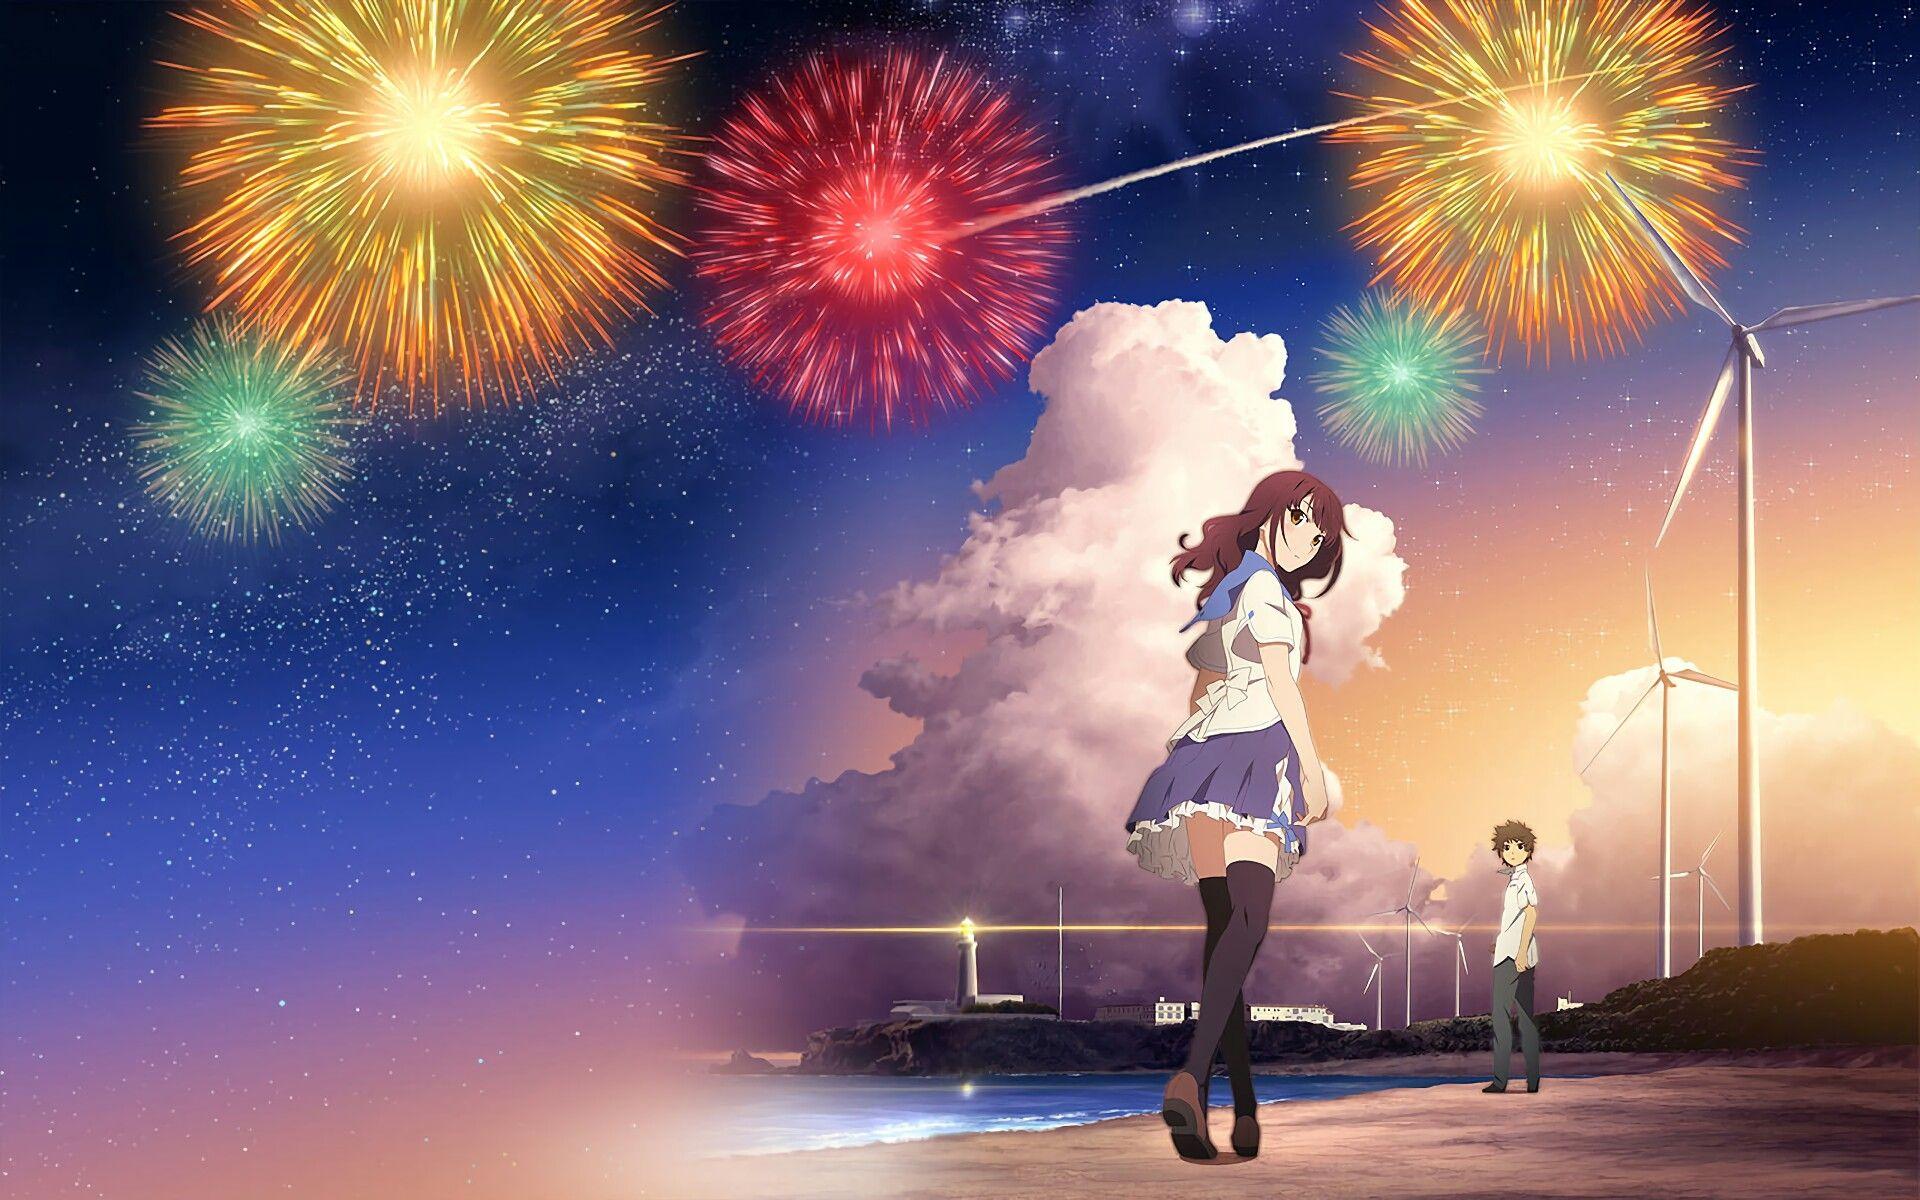 Pin By S C N On Anime Art Hanabi Anime Anime Movies Fireworks anime hd wallpaper